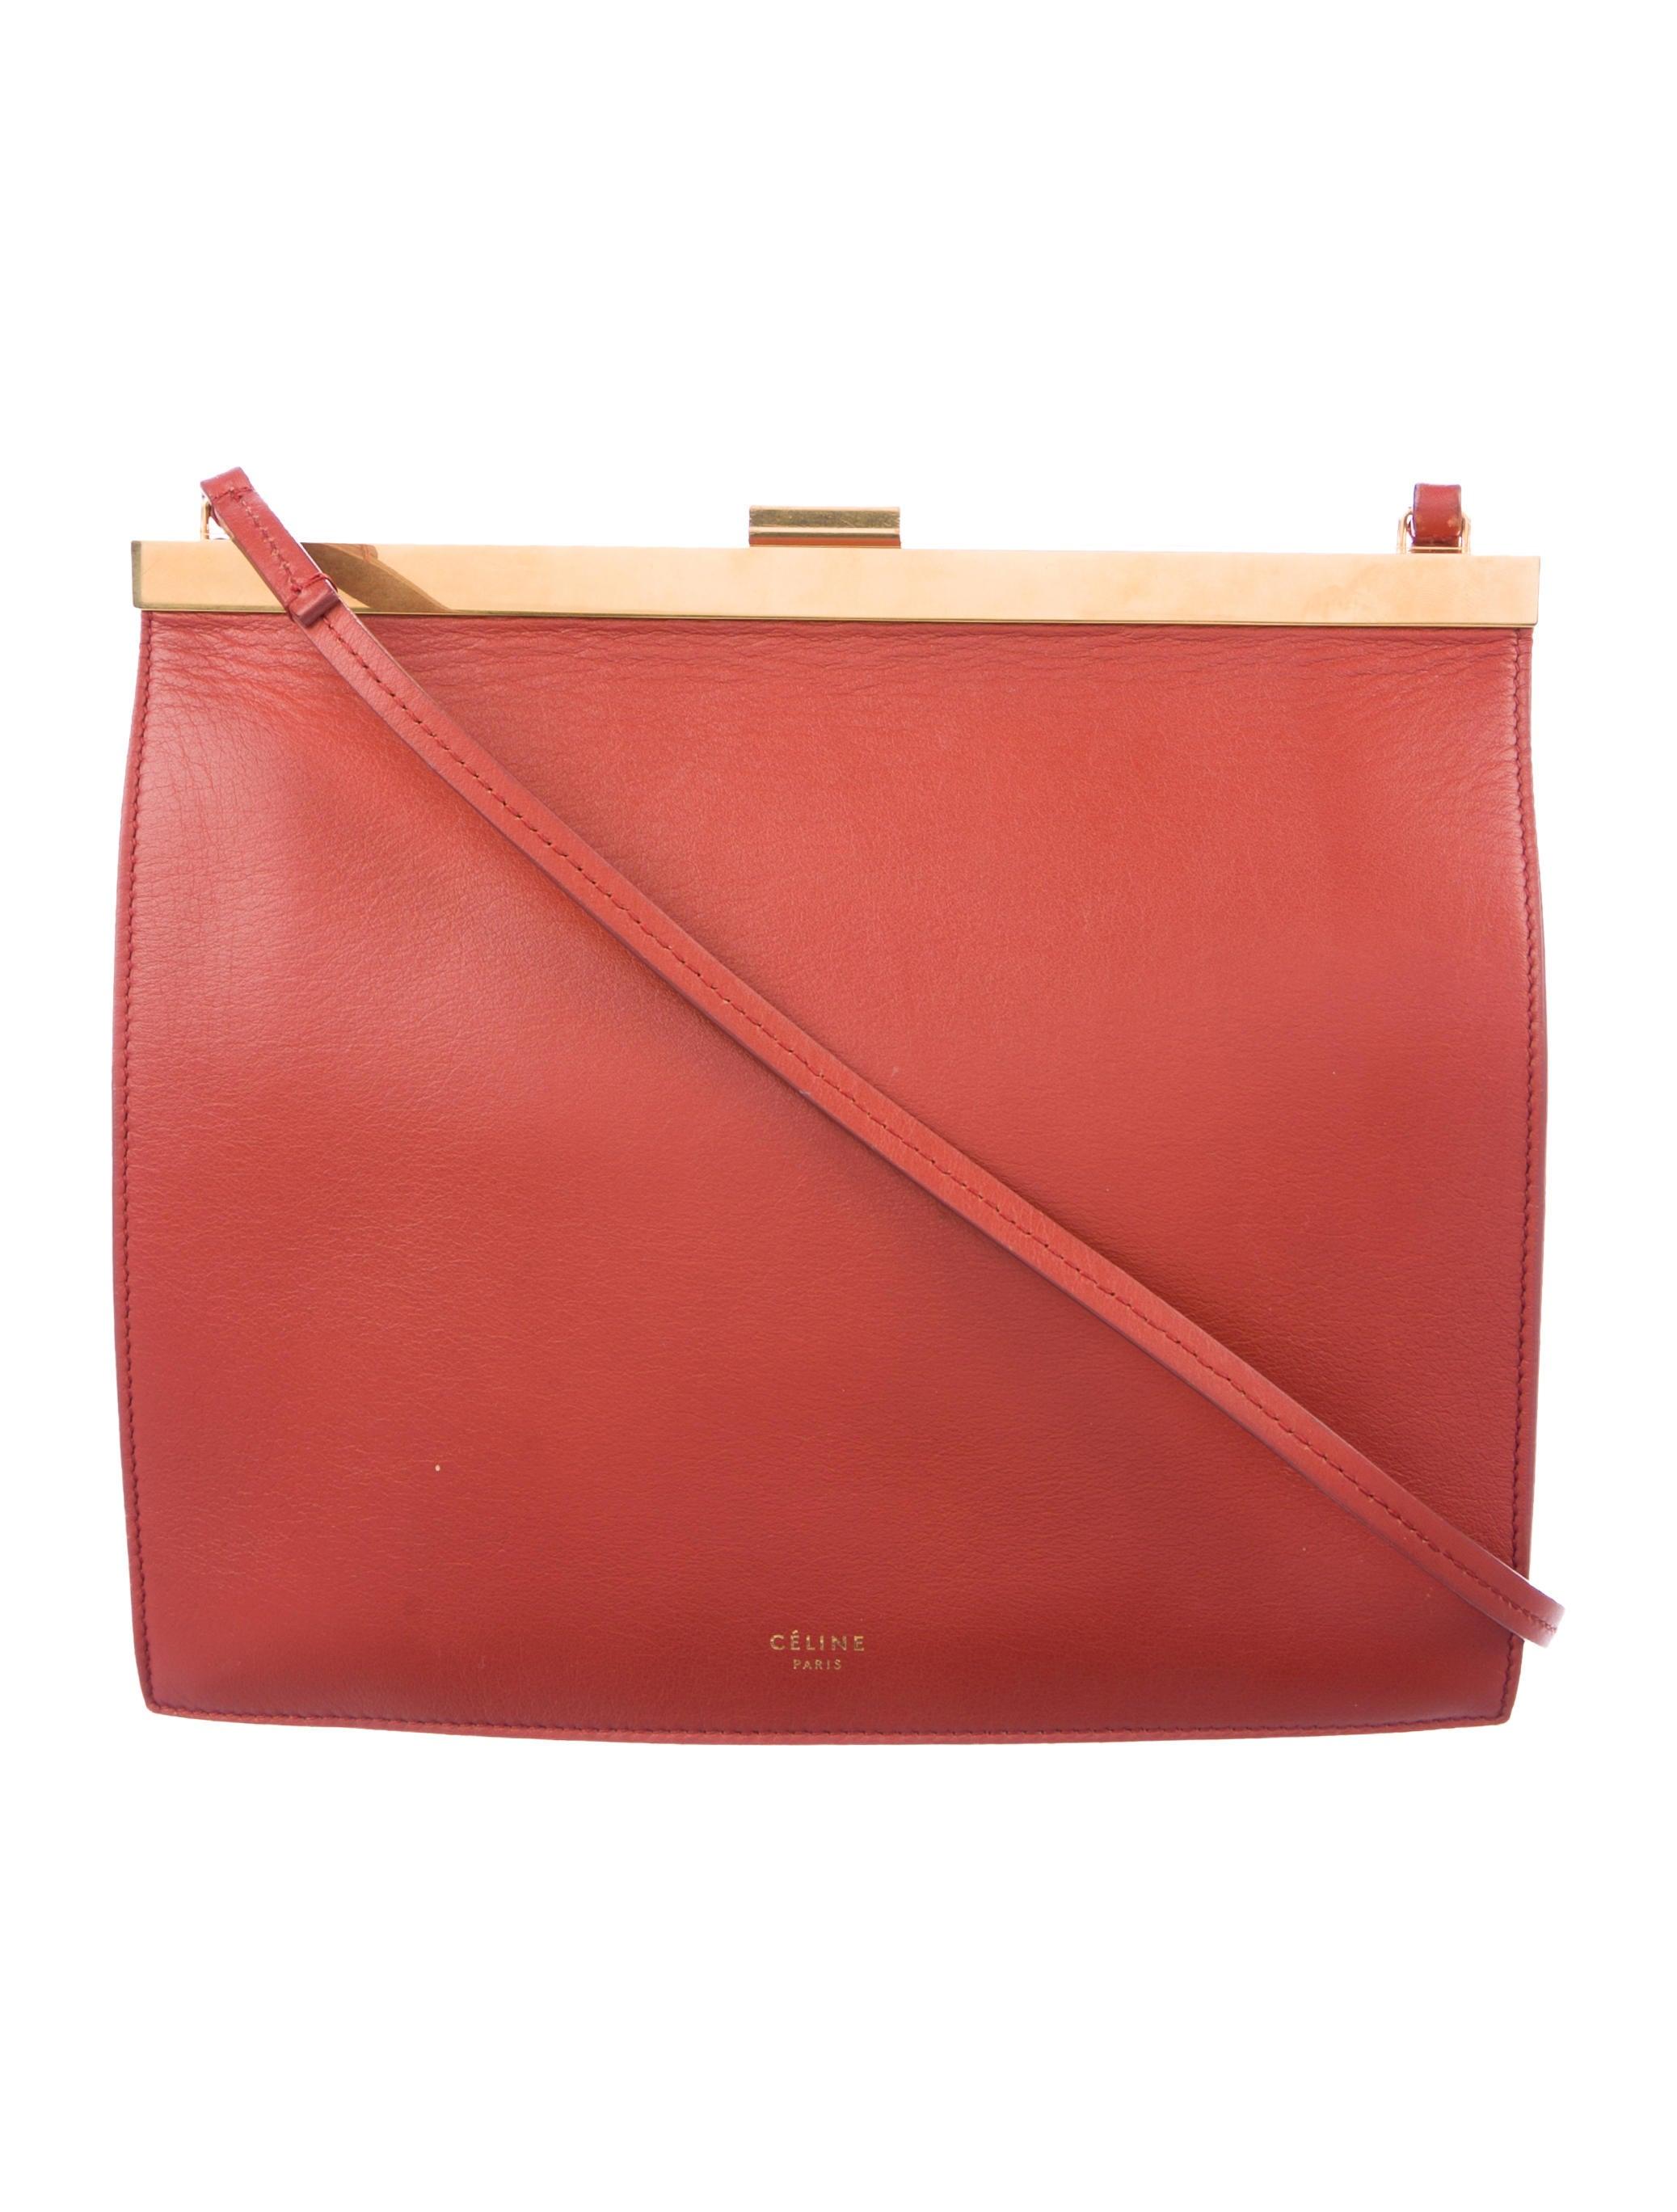 0546704ab5573 Celine Céline 2017 Mini Clasp Bag - Handbags - CEL65497